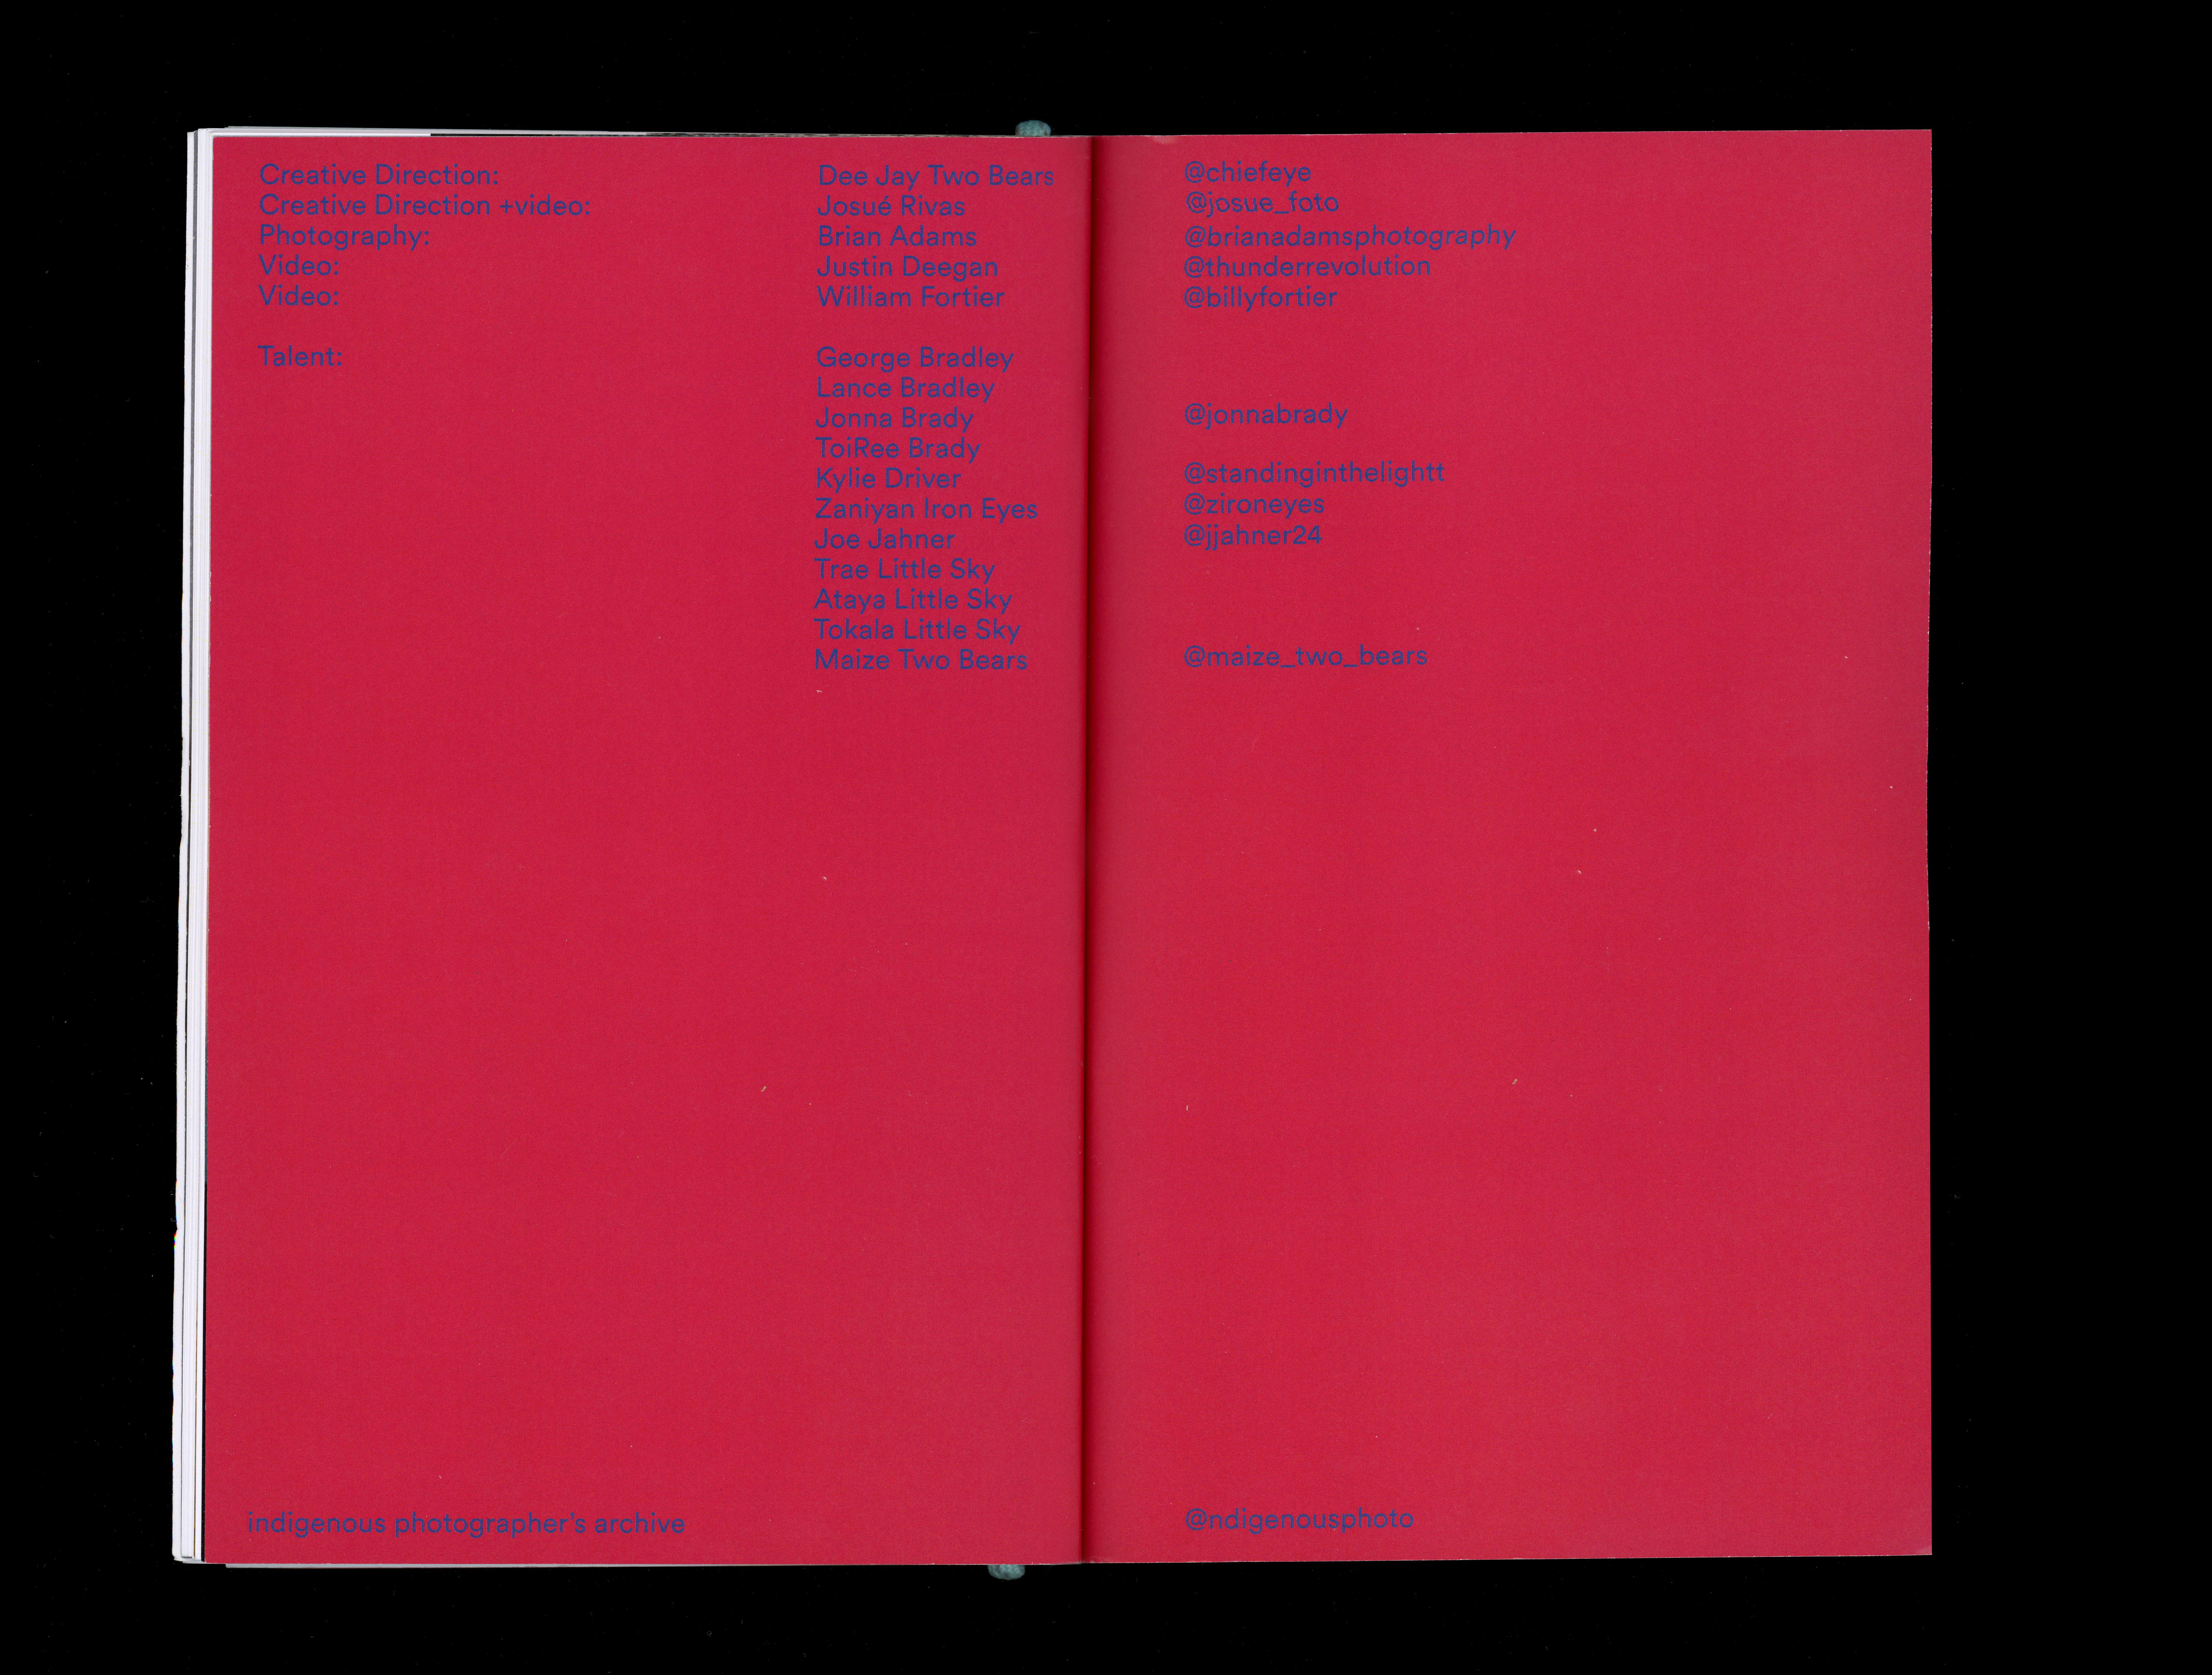 Book spread of image credits